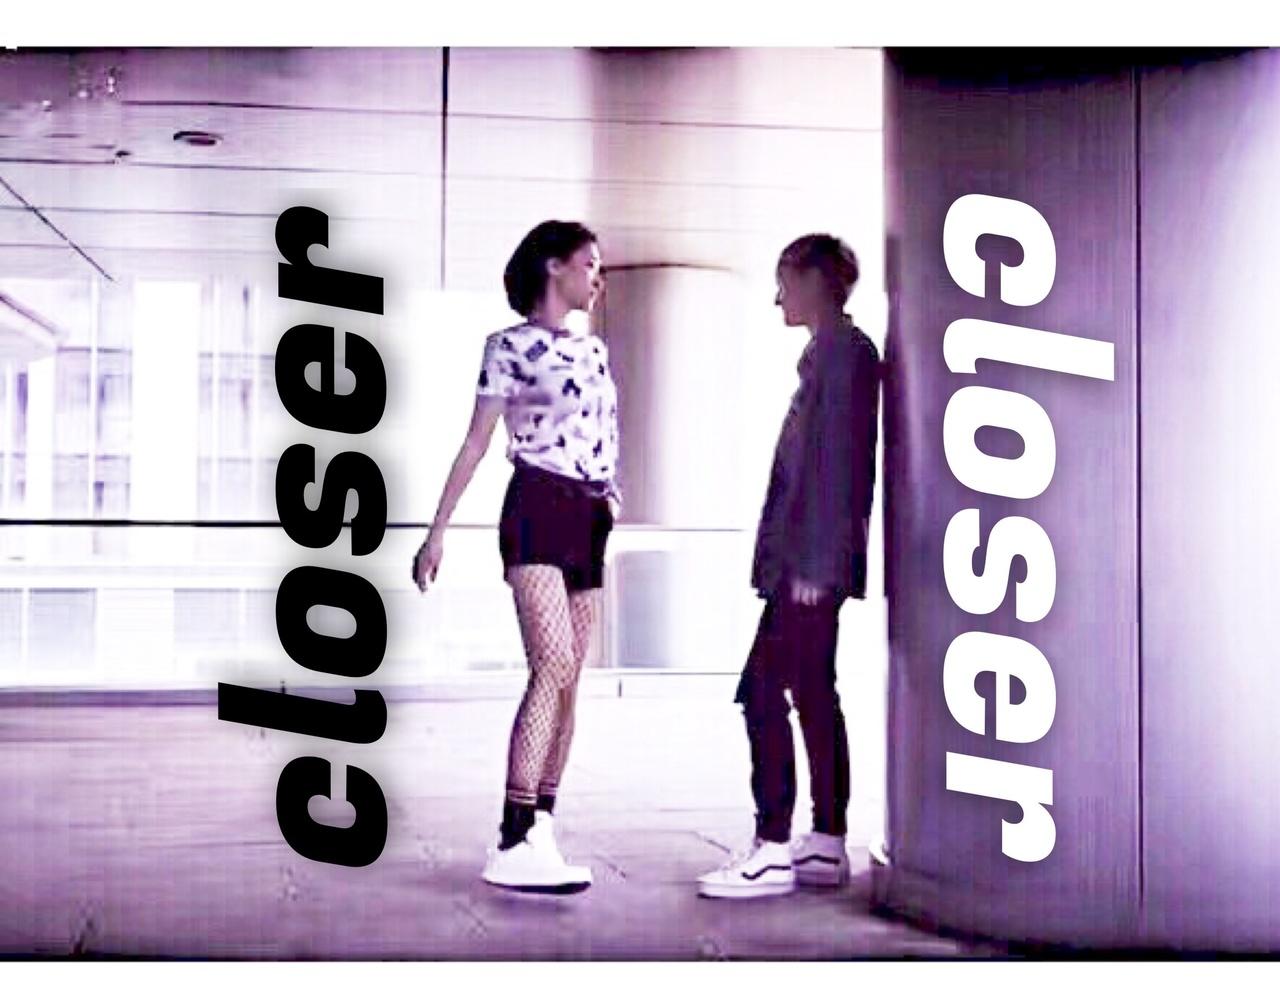 【X-Square Dance Lab】原创舞蹈Closer官方正版完整镜面分解教学视频